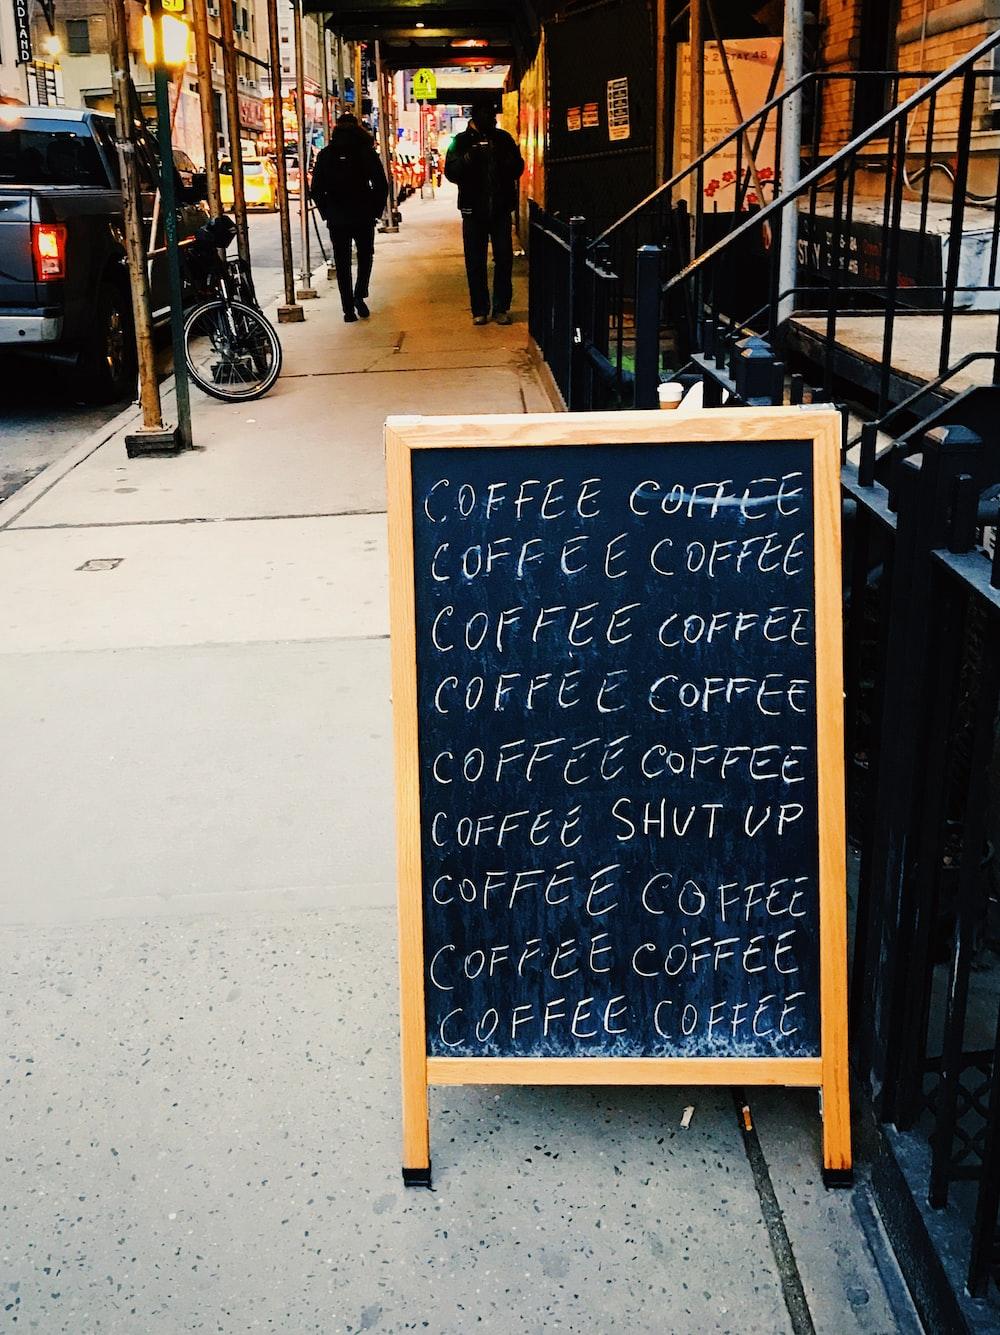 coffee signs near buildings